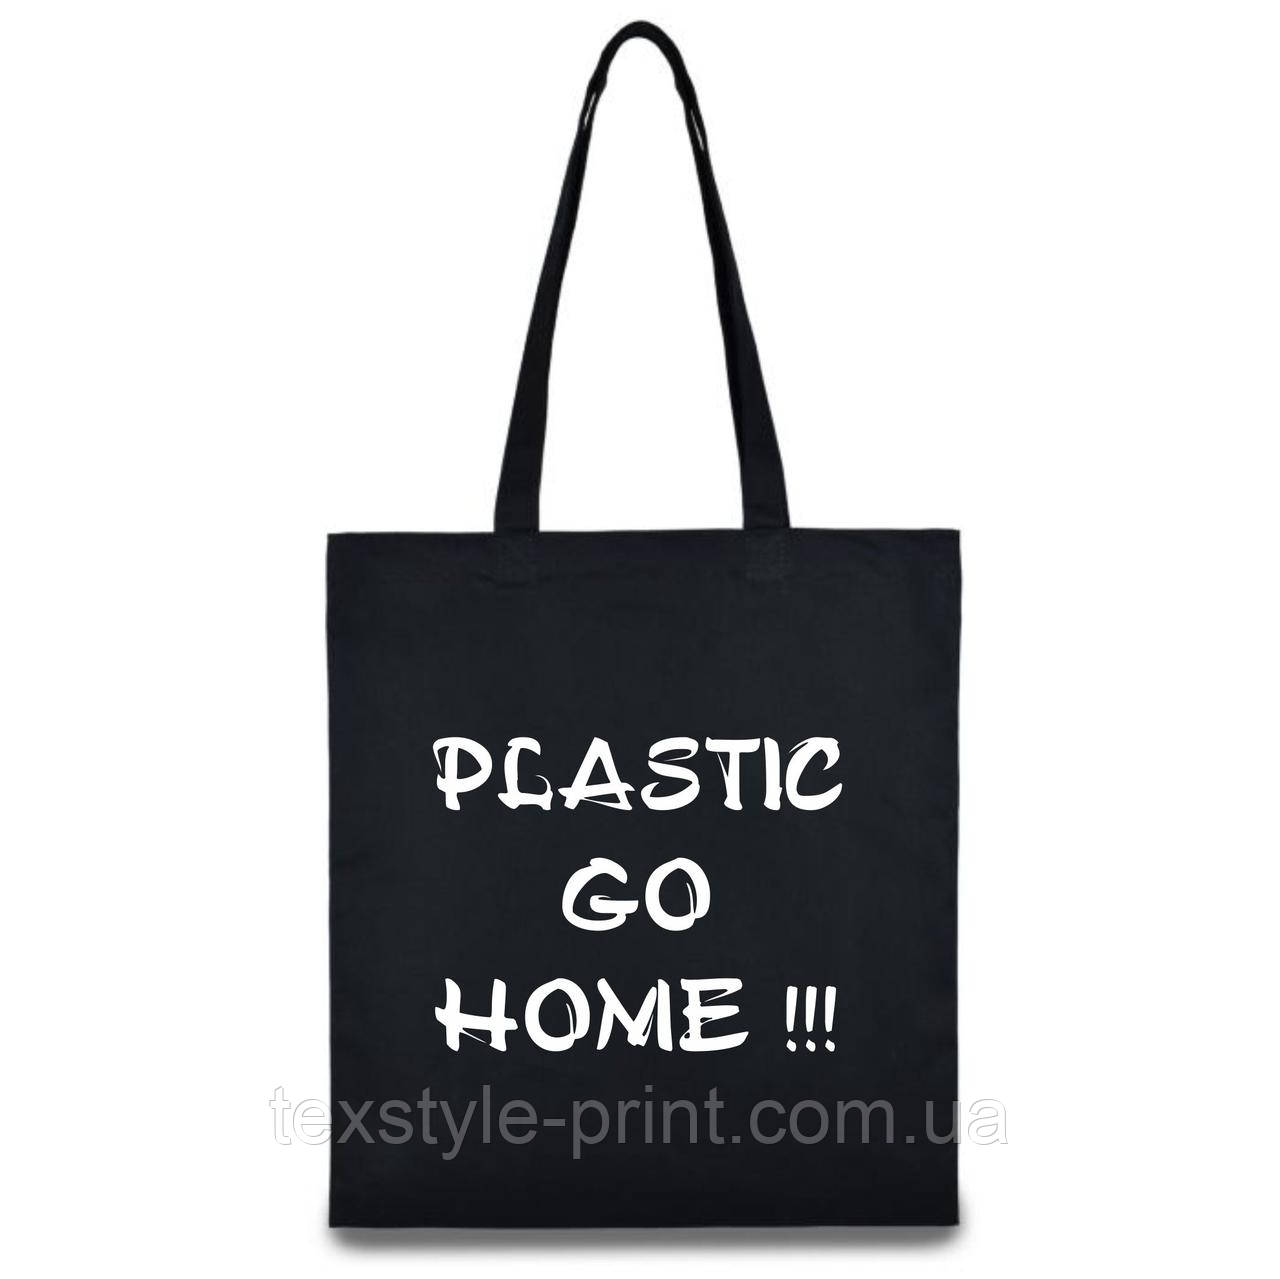 Эко сумка из хлопка. PLACTIC GO HOME